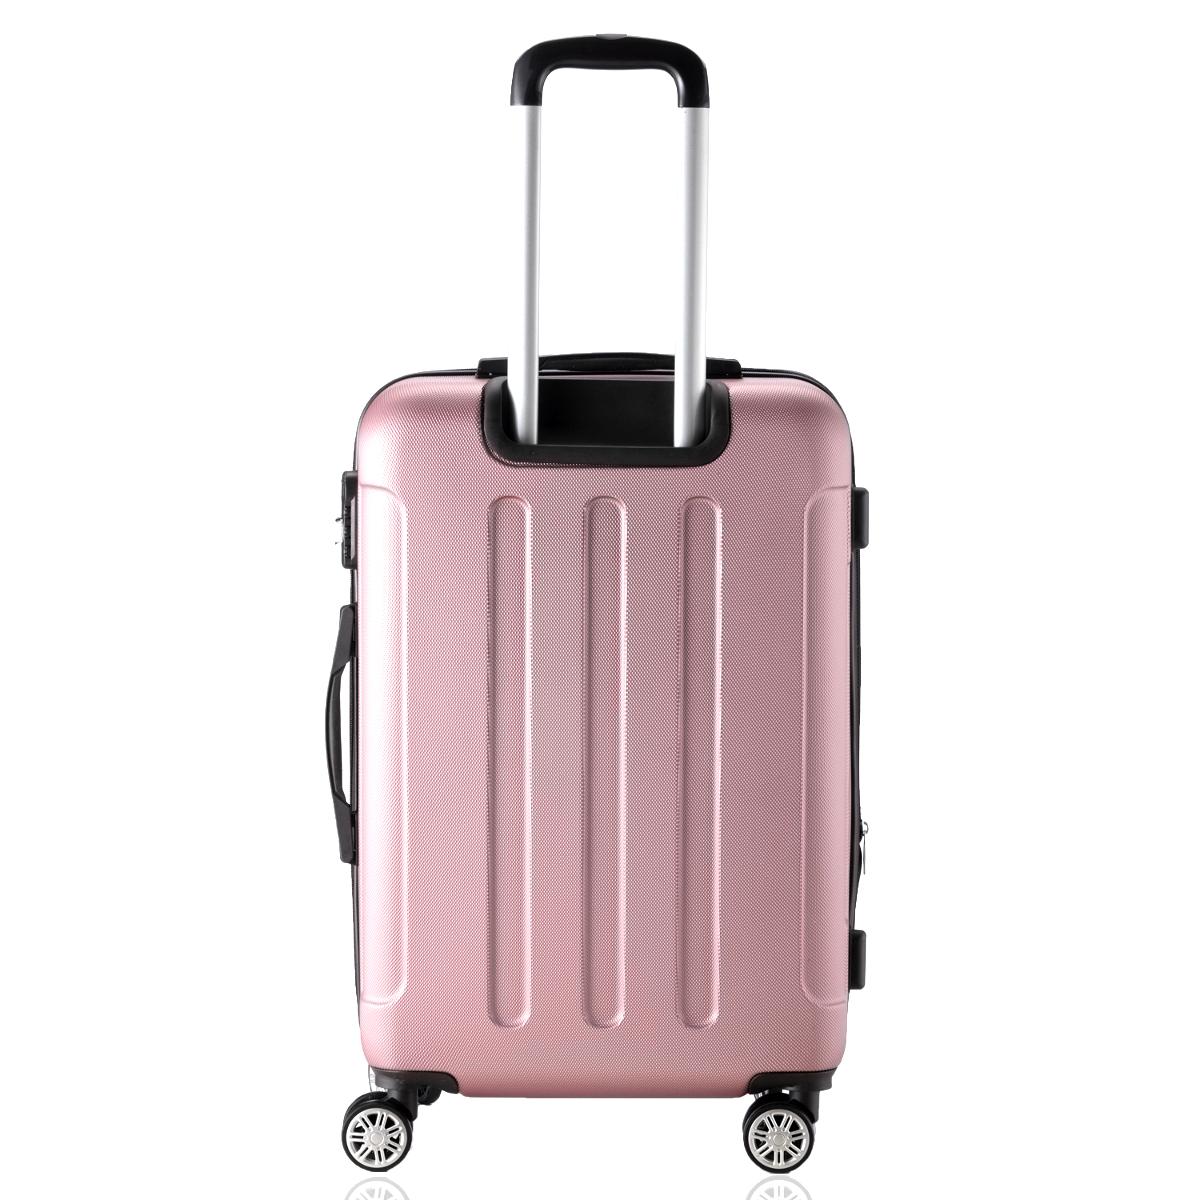 Koffer-Flexot-2045-Hartschalenkoffer-Trolley-Kofferset-Reisekoffer-M-L-XL-Set Indexbild 25